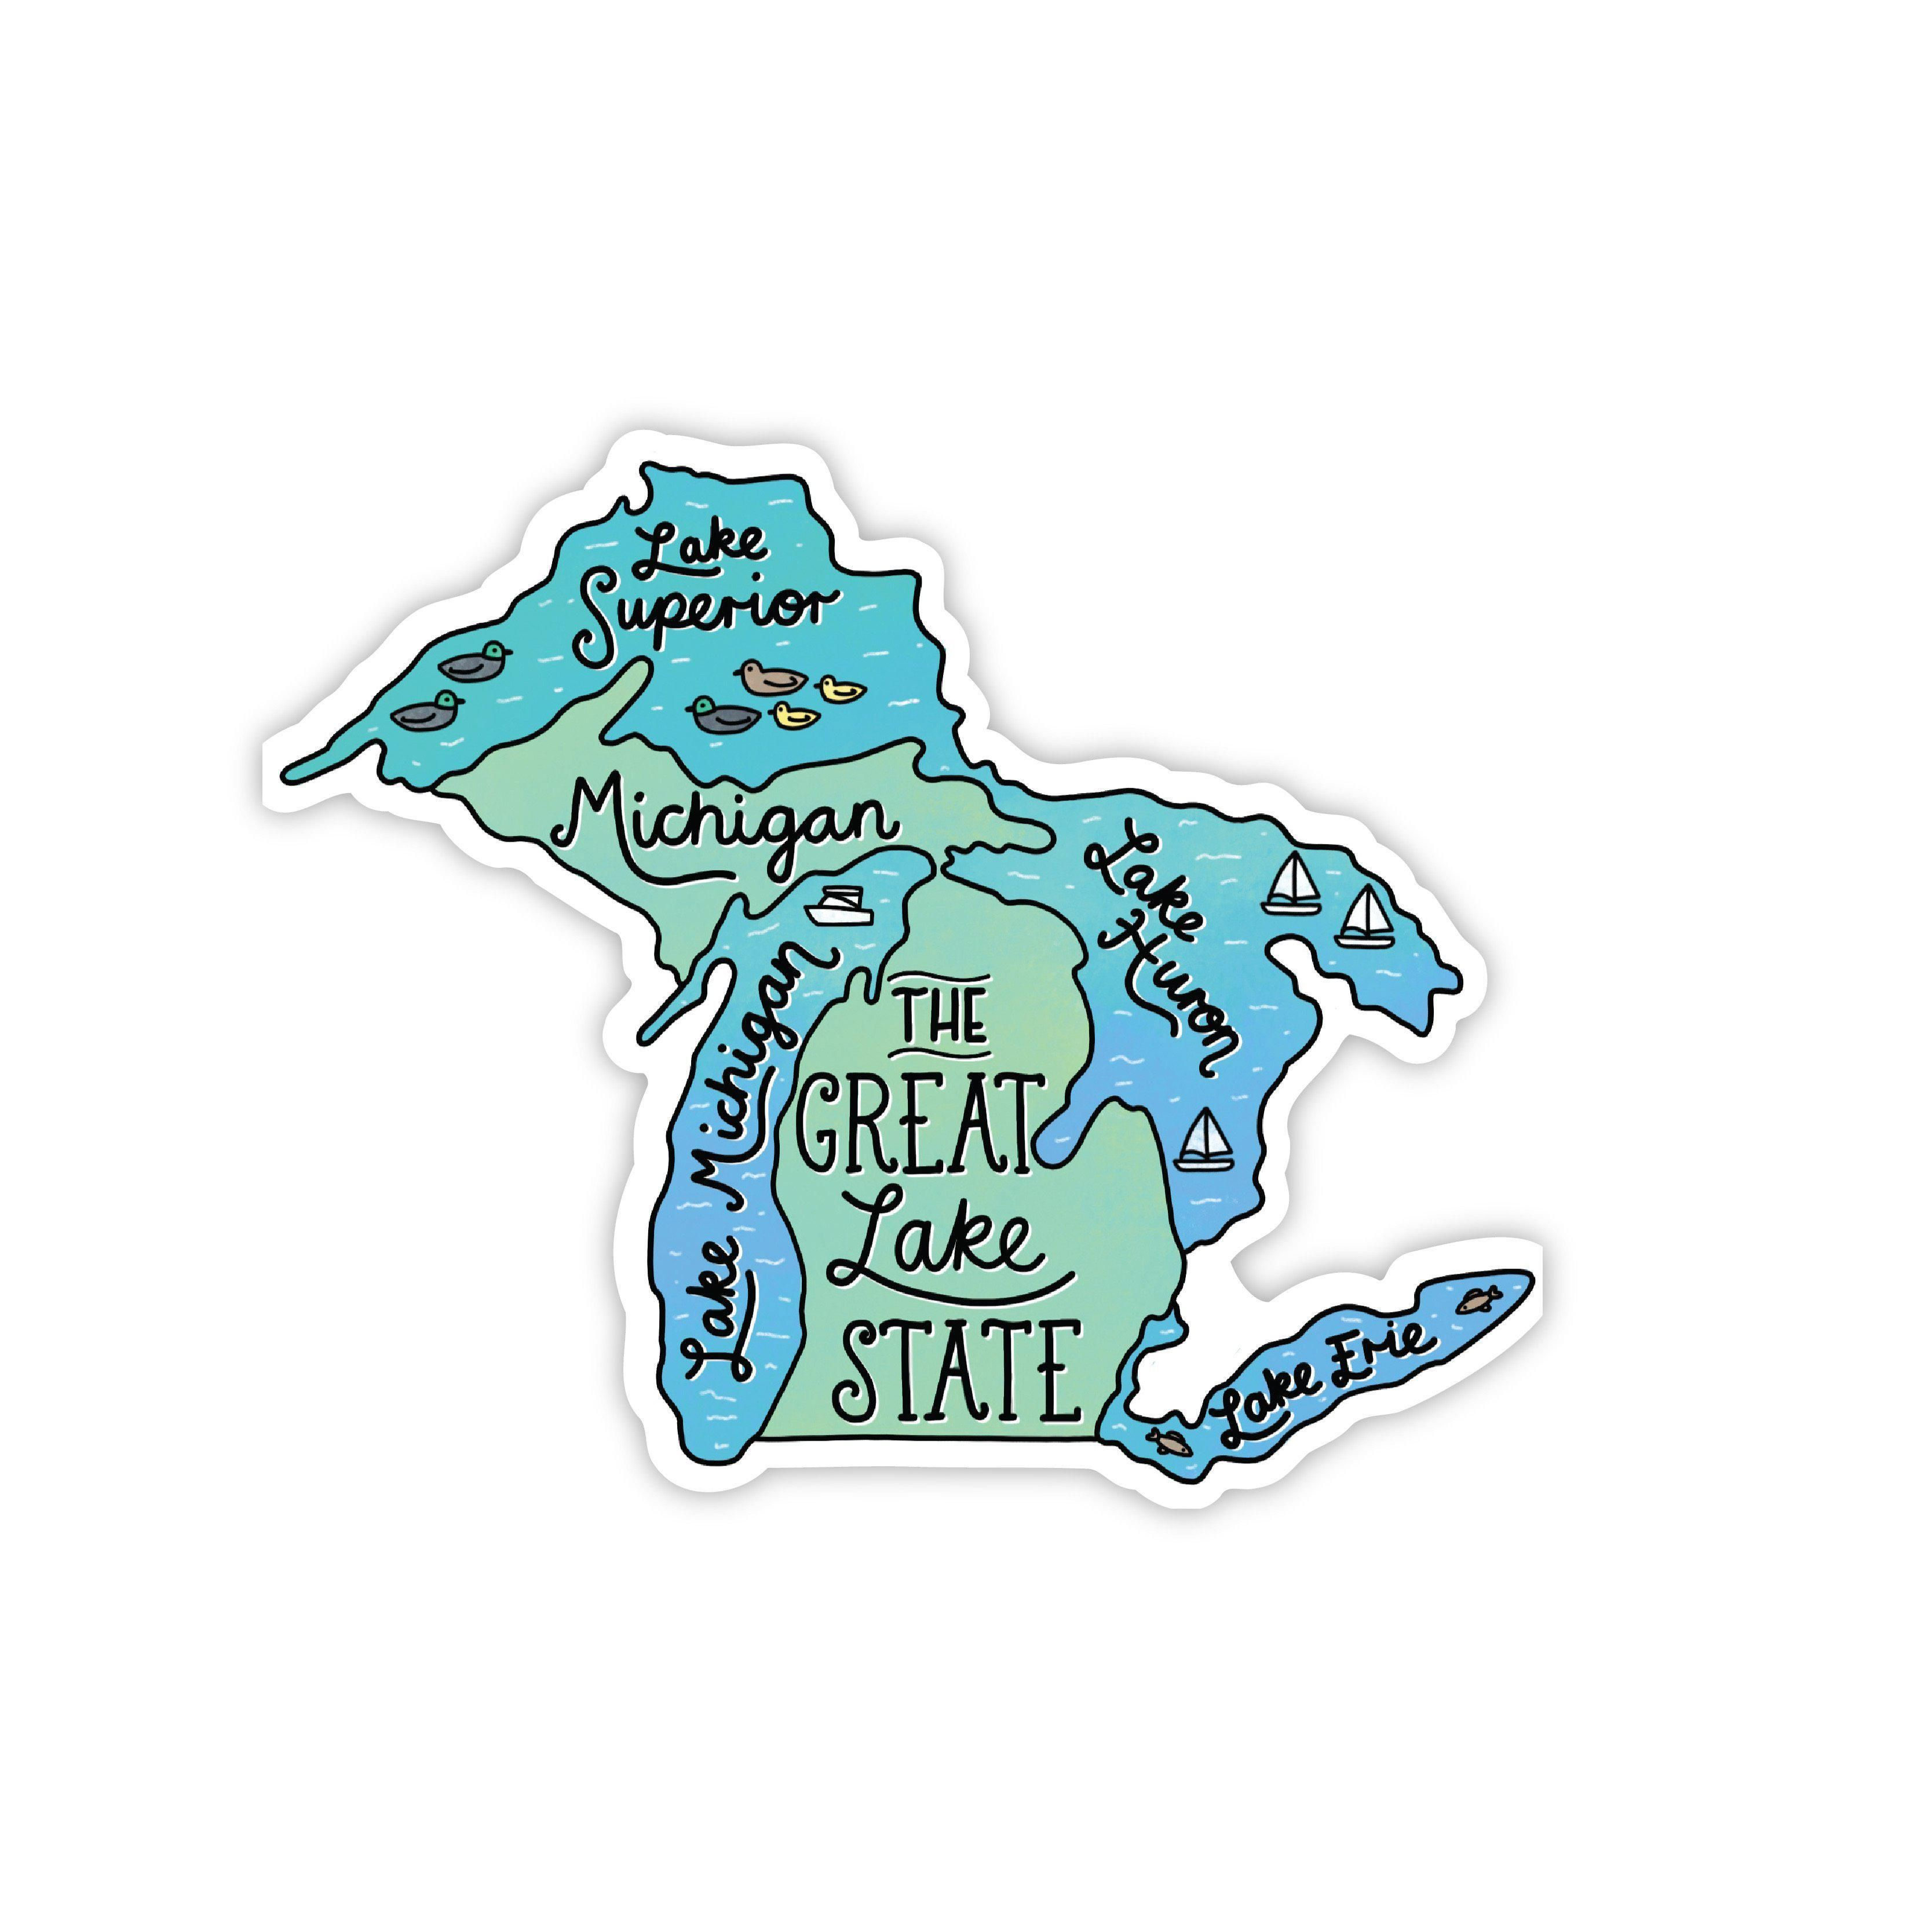 The Great Lake State Sticker In 2021 Michigan Sticker Michigan New Sticker [ jpg ]